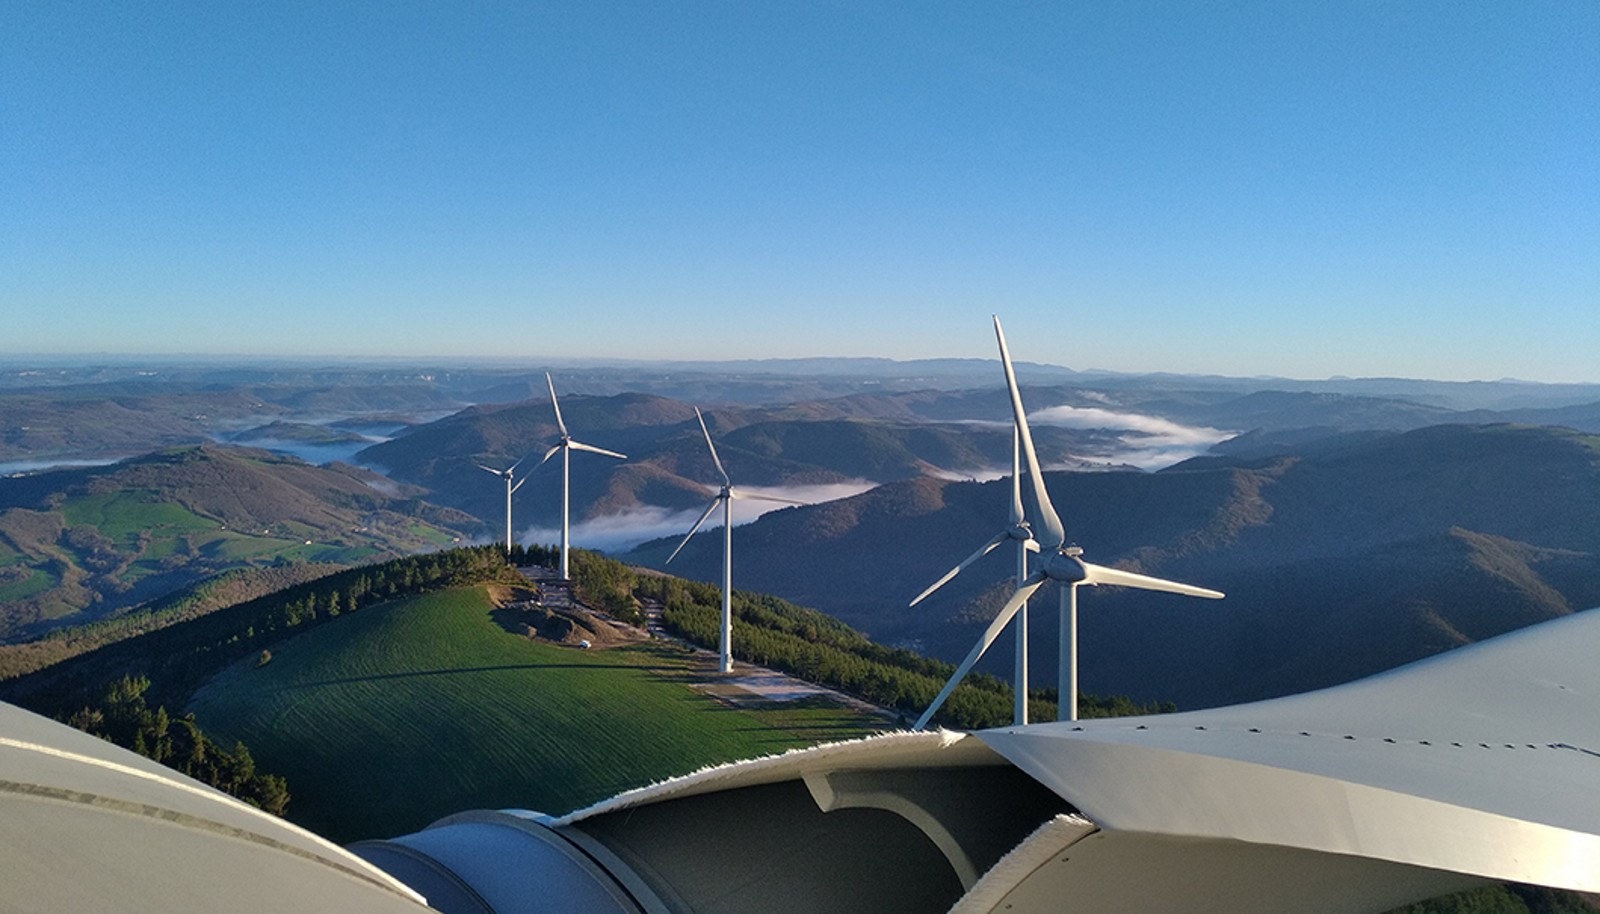 EnBW provides energy to over 6 million customers across Europe. Photo via EnBW.